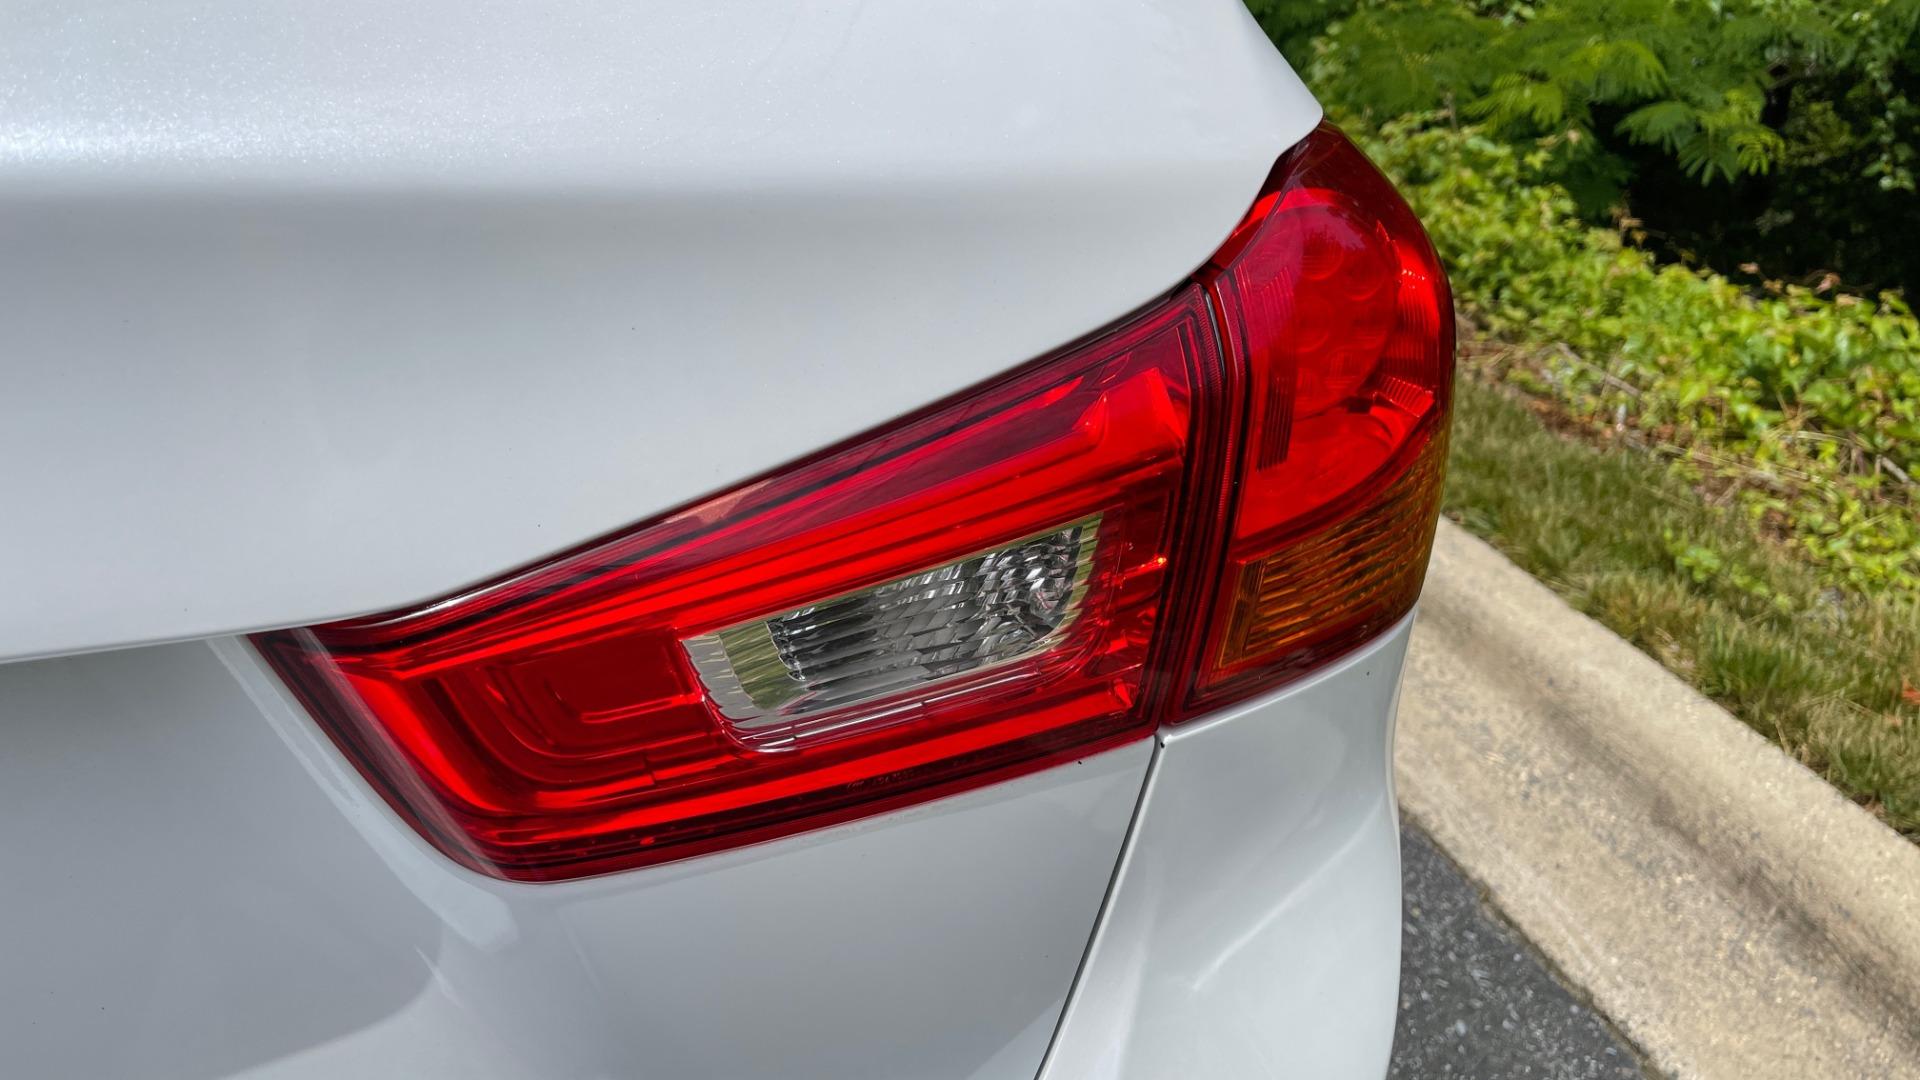 Used 2014 Mitsubishi OUTLANDER SPORT ES 2WD / 2.0L / CVT TRANS / 18IN WHEELS / 31MPG for sale $8,495 at Formula Imports in Charlotte NC 28227 18